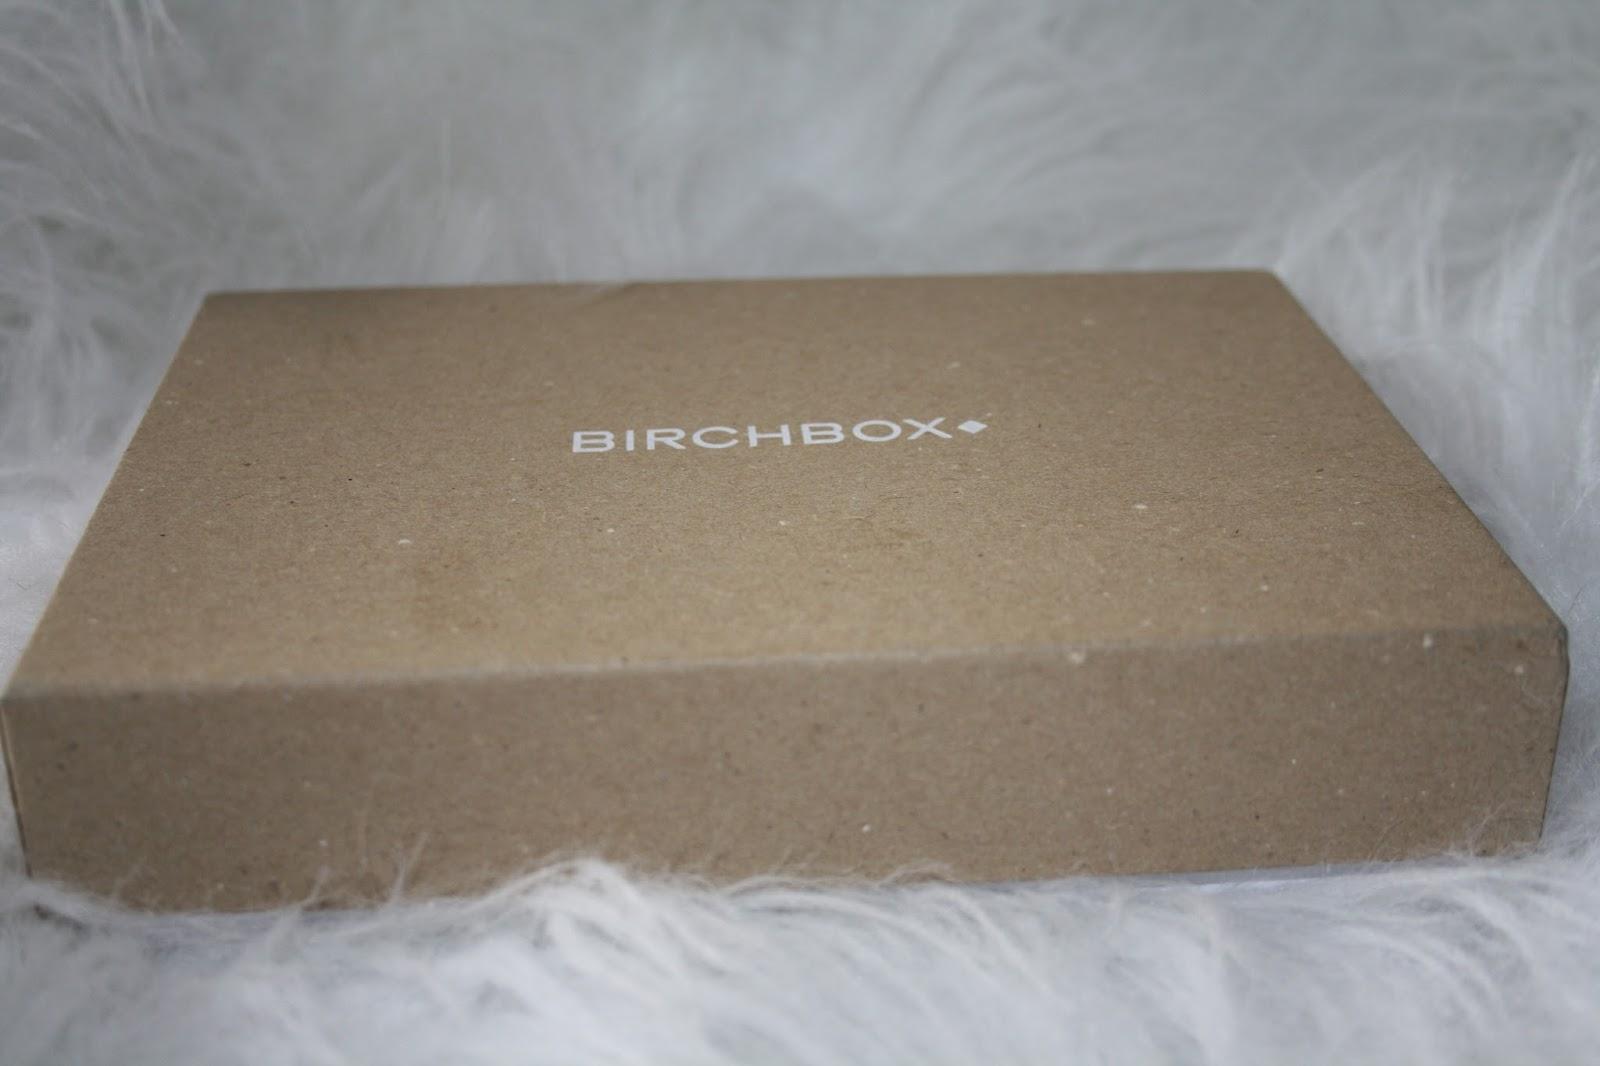 Birchbox Slimbox